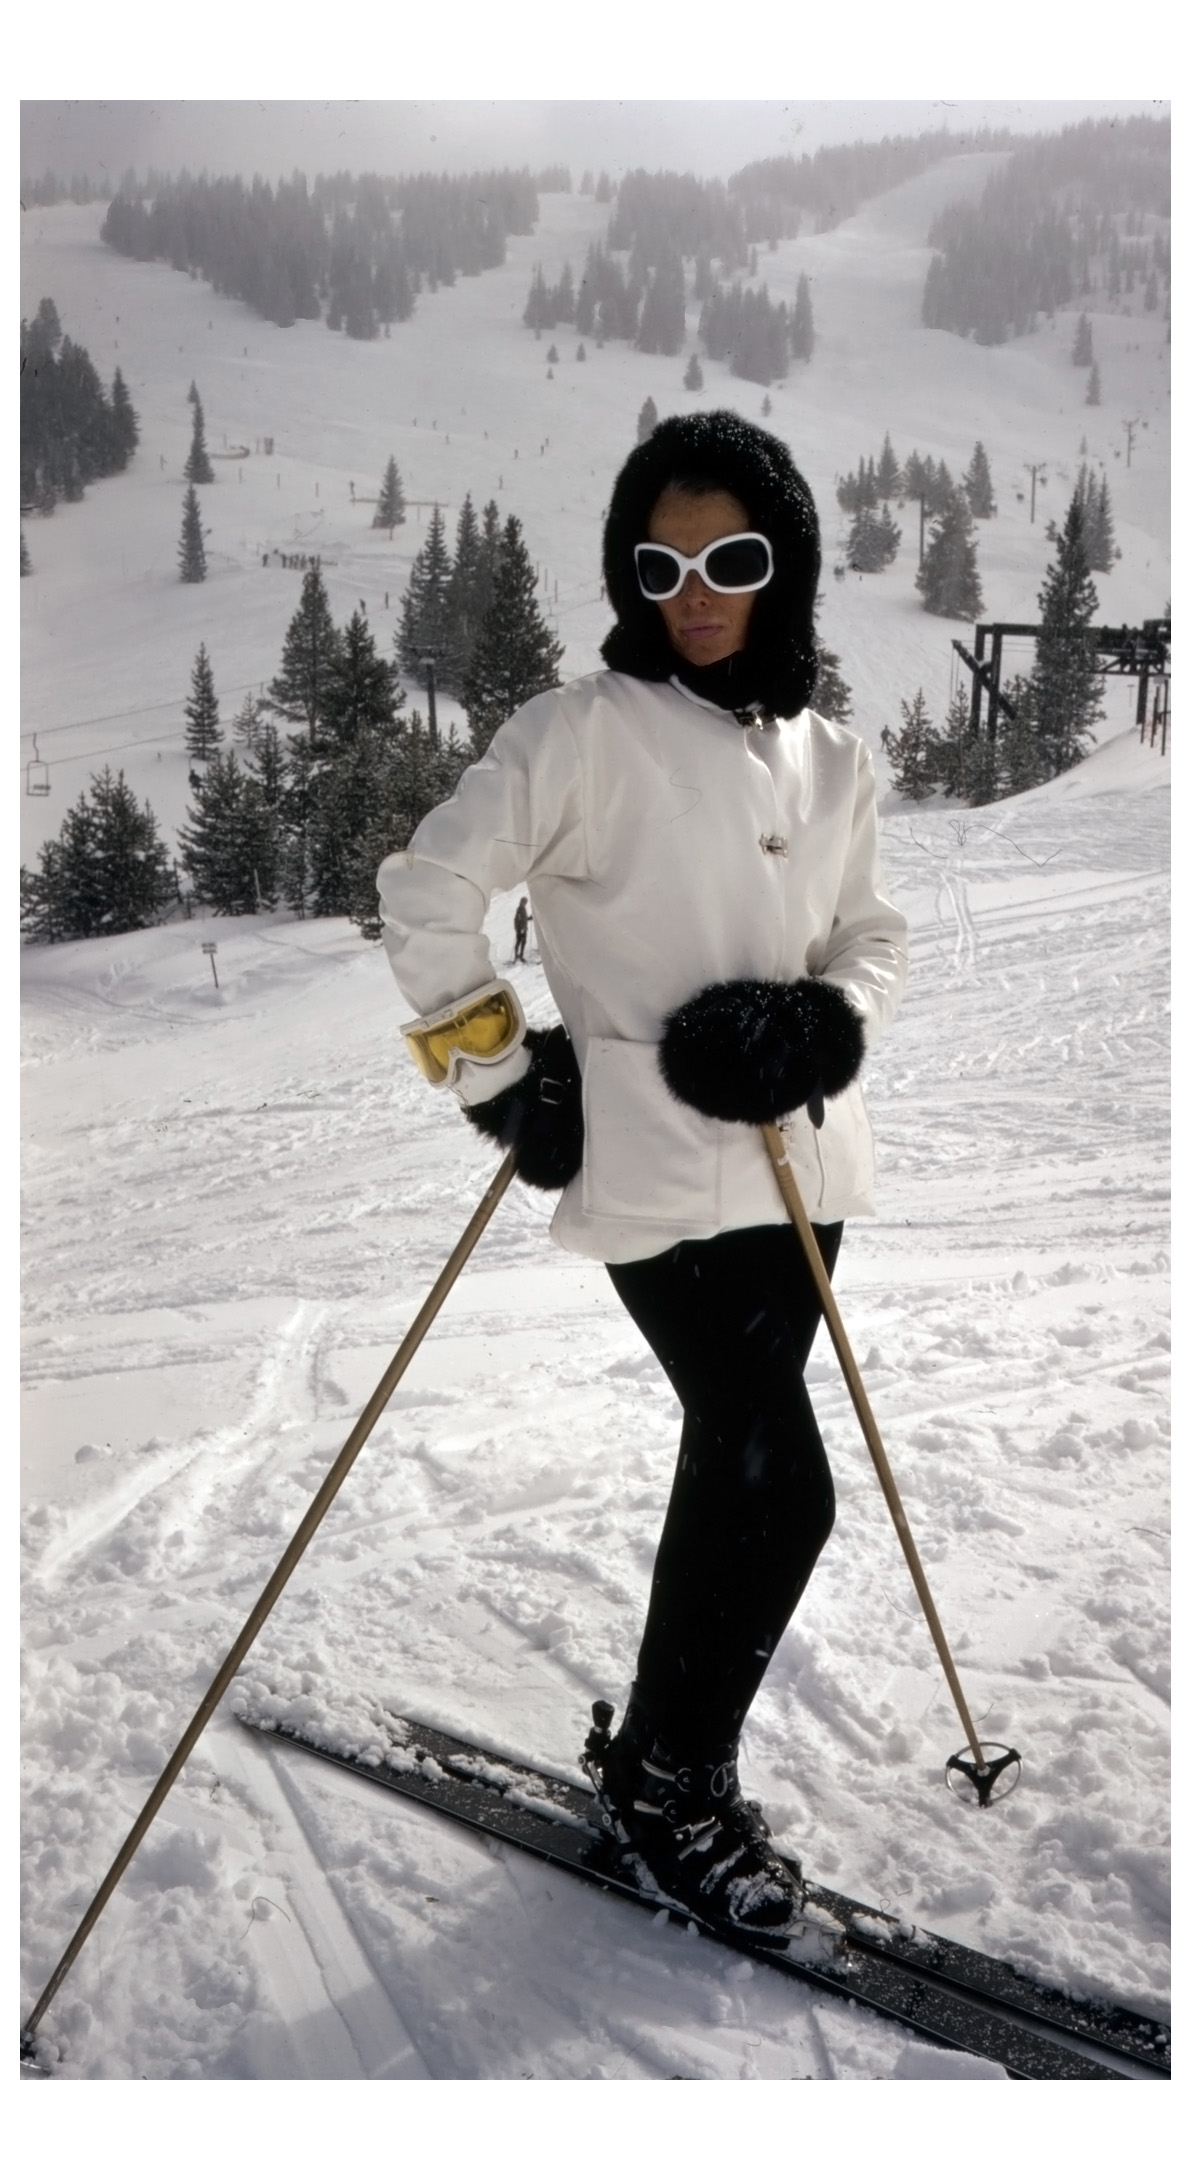 ann-bonfoey-taylor-full-length-portrait-wearing-a-ski-outfit-including-a-white-vinyl-jacket-black-pants-and-a-black-rabbit-hood-vail-colorado-1967.jpg